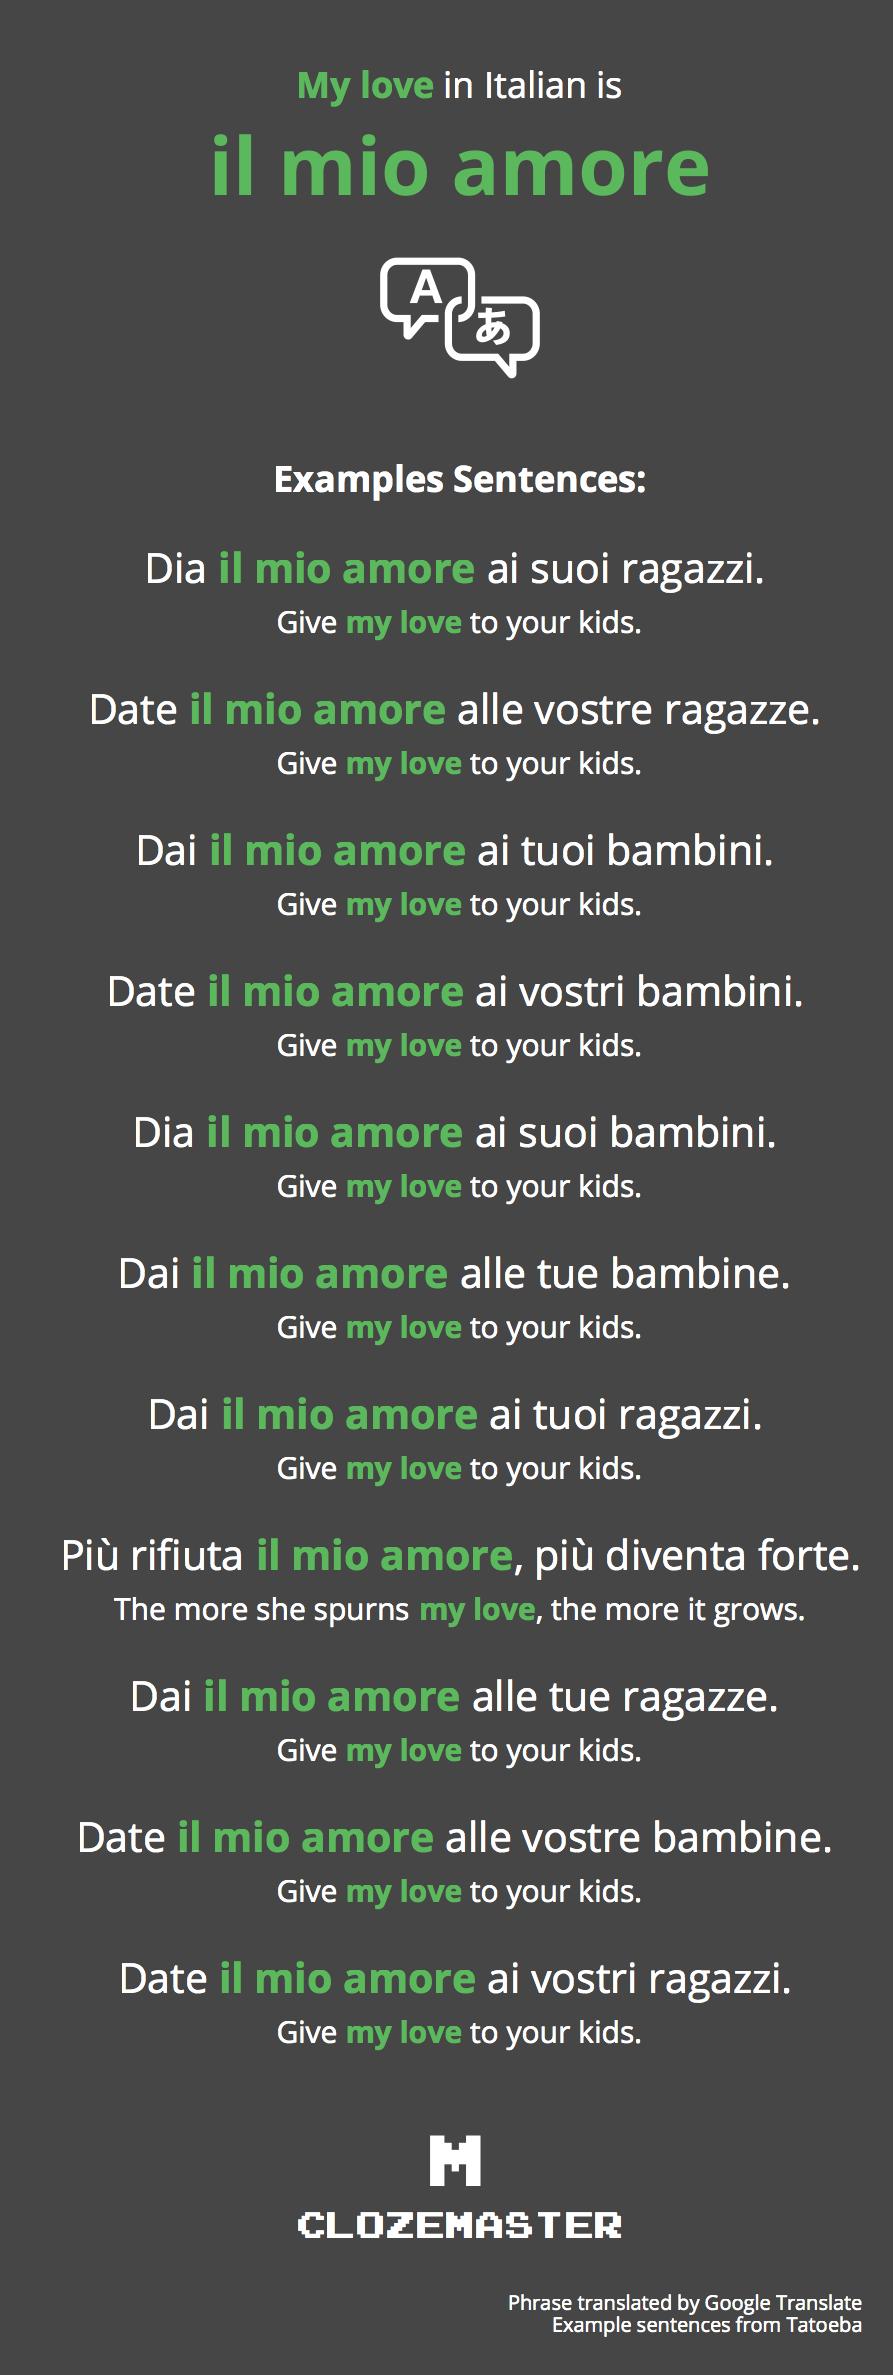 How To Say My Love In Italian Clozemaster